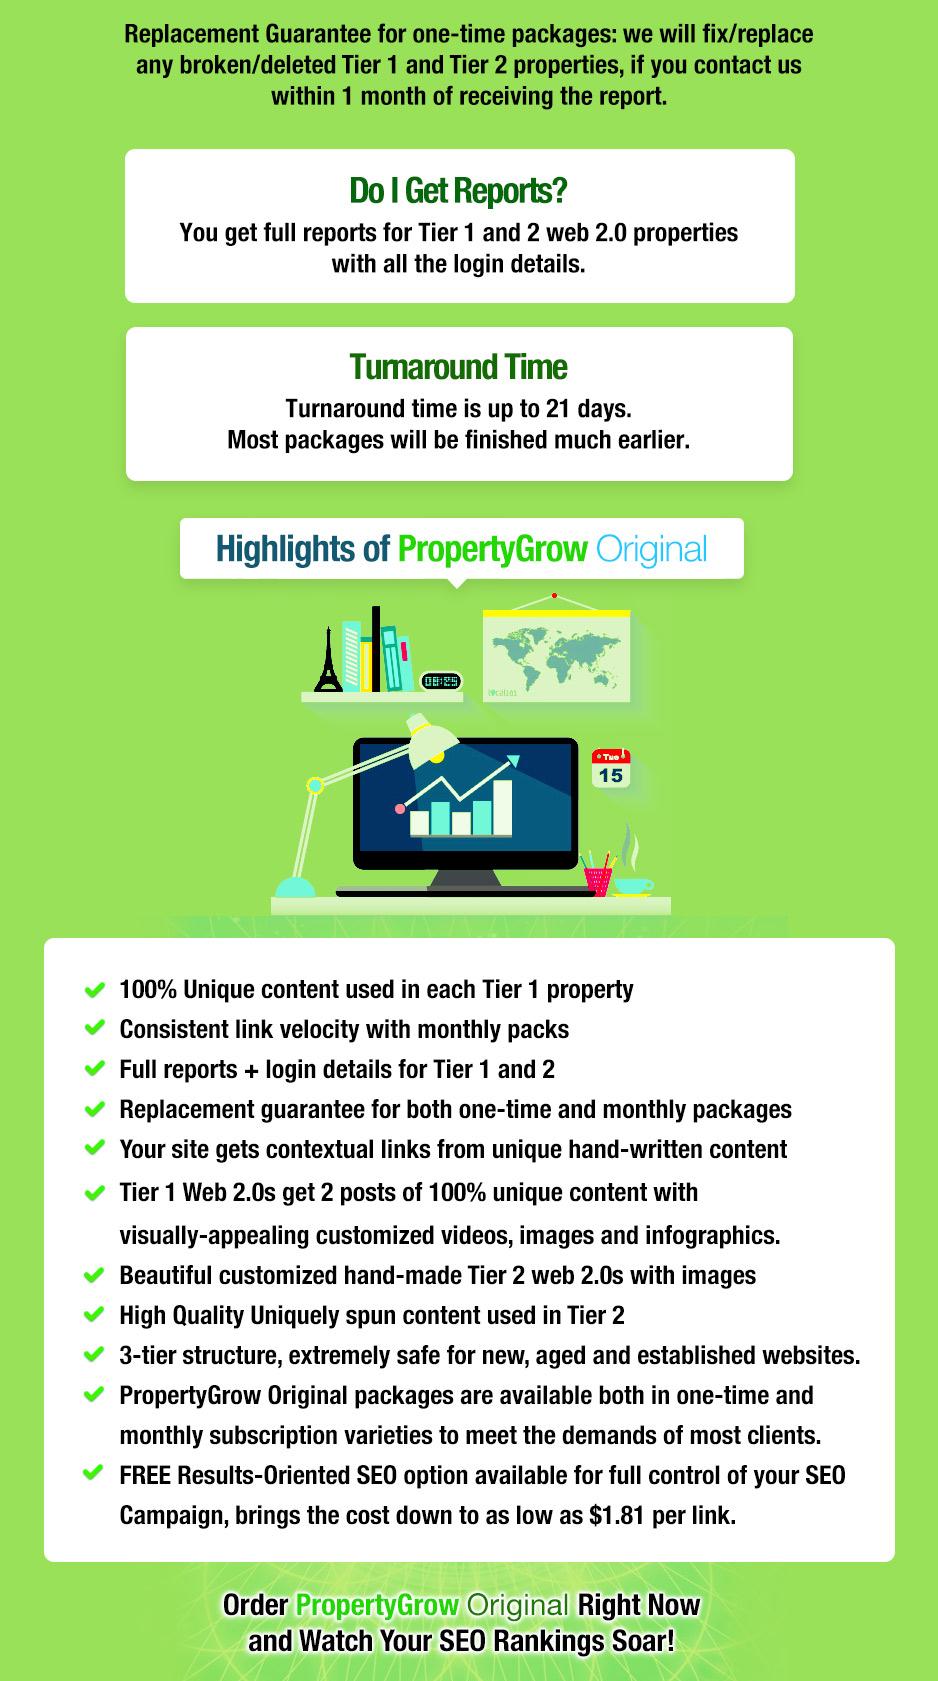 PropertyGrowOriginal_05